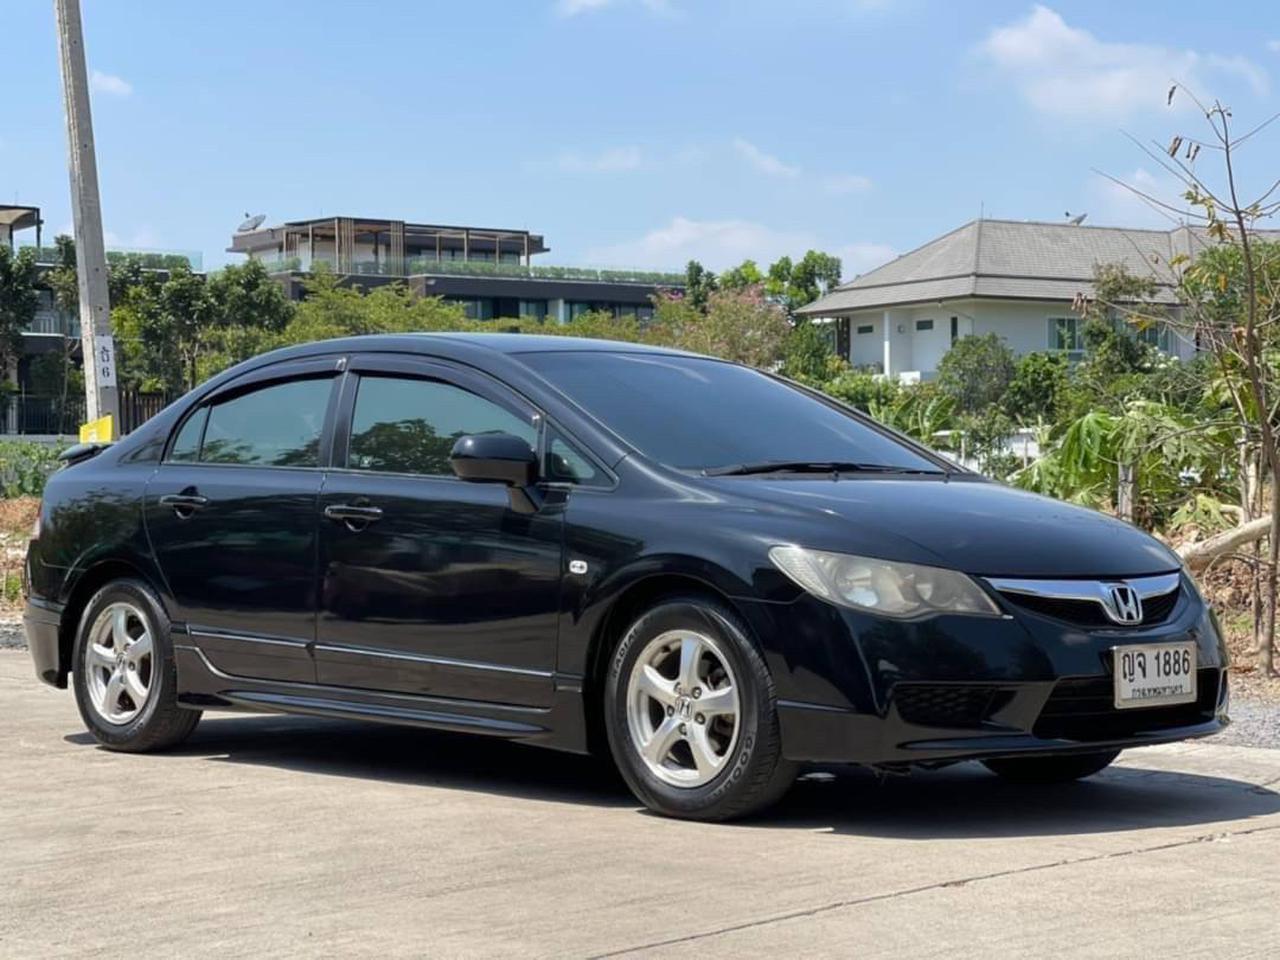 59 Honda Civic 1.8 S MNC (FD) ปี 2009 สีดำ  เกียร์ออโต้ รูปที่ 3